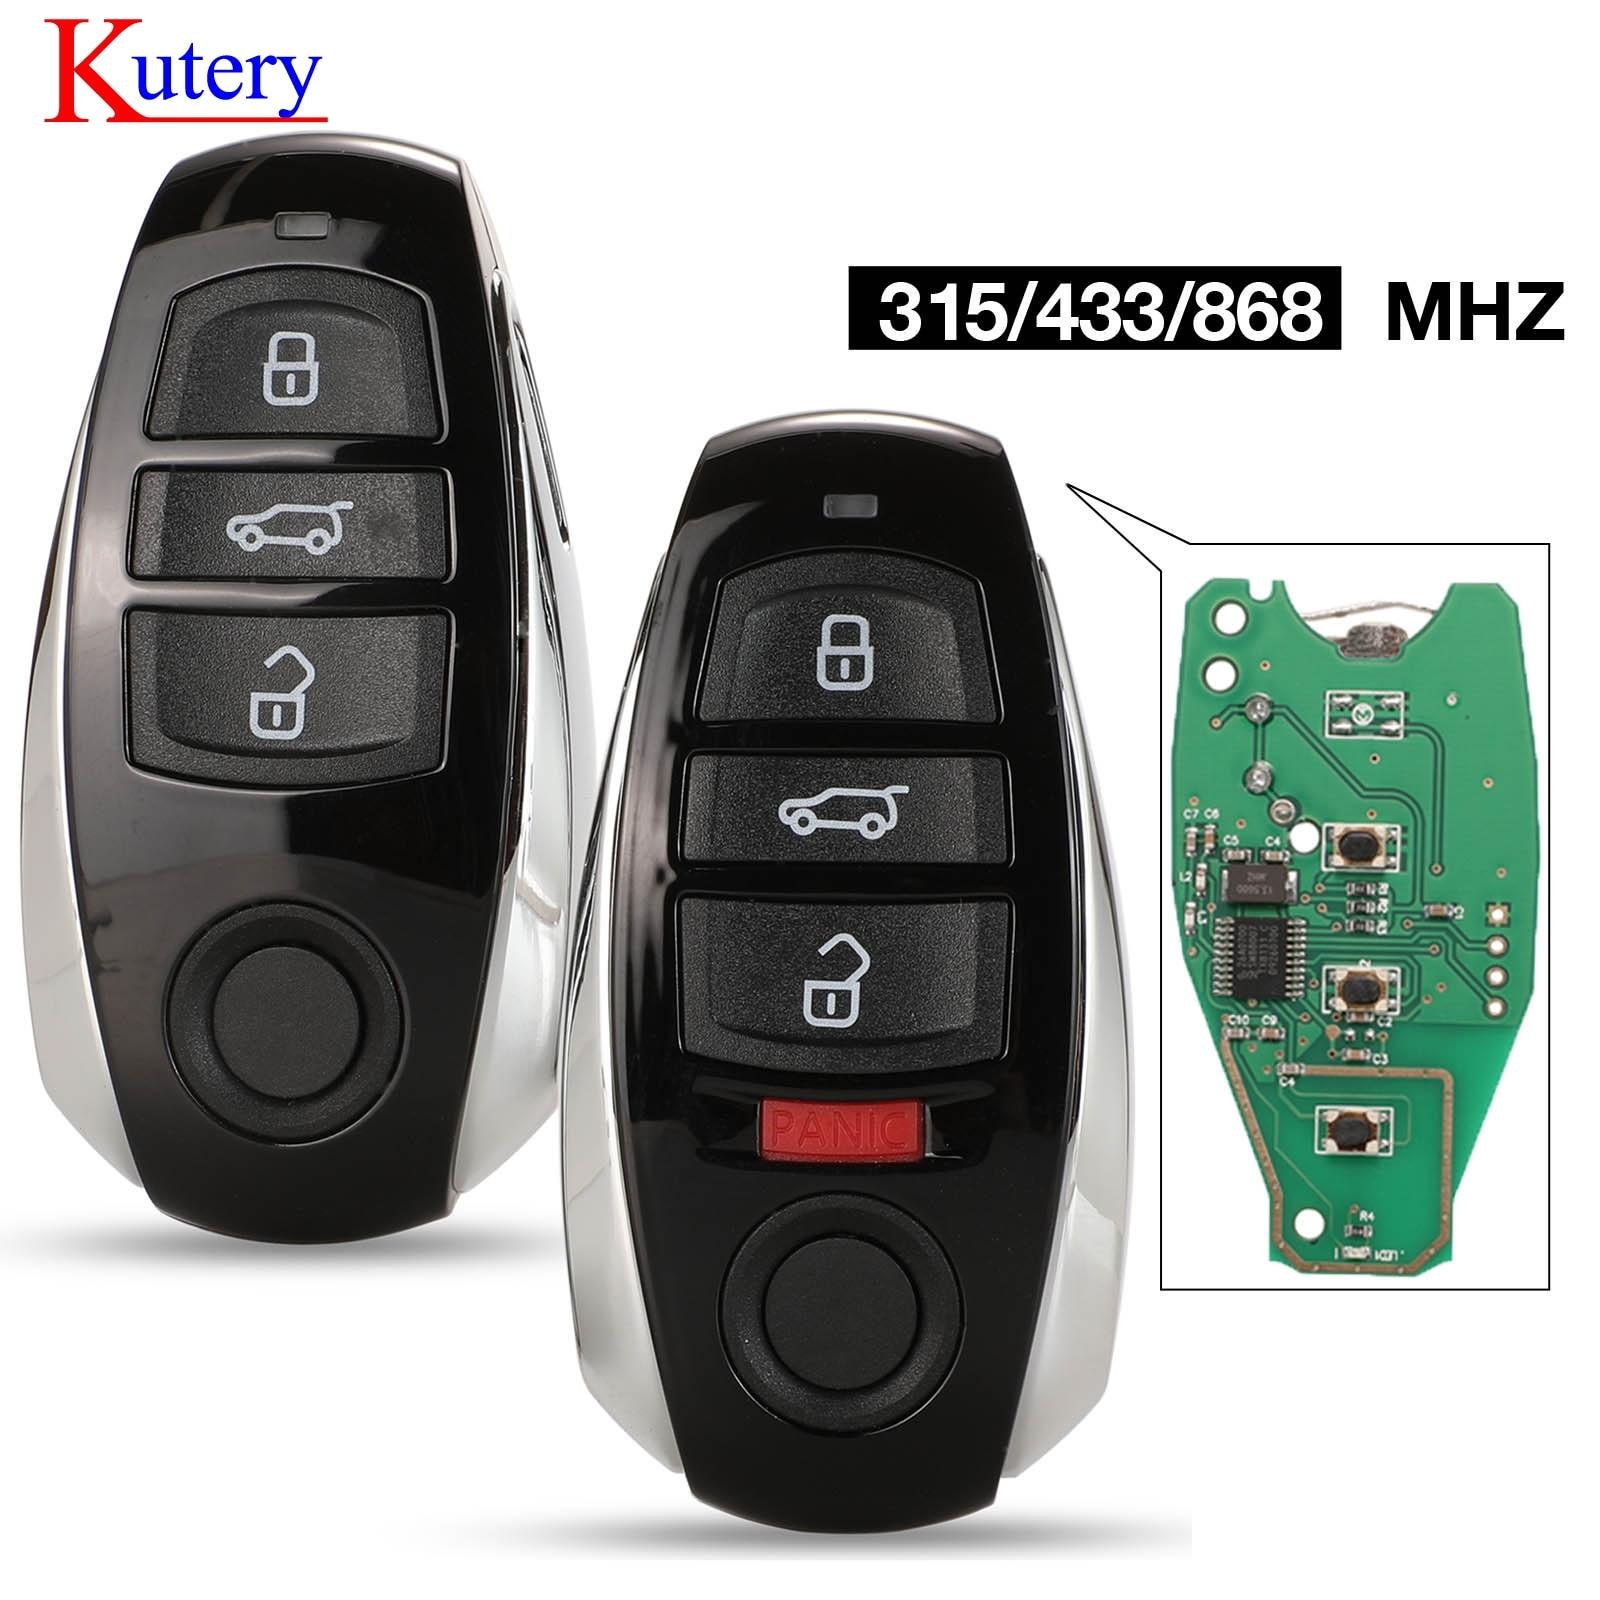 Kuery 315/ 433/ 868MHz ID46/ 7953 Chip 3 Botón de reemplazo de tarjeta inteligente llave Fob remoto para Volkswagen para Touareg 2010-2014/